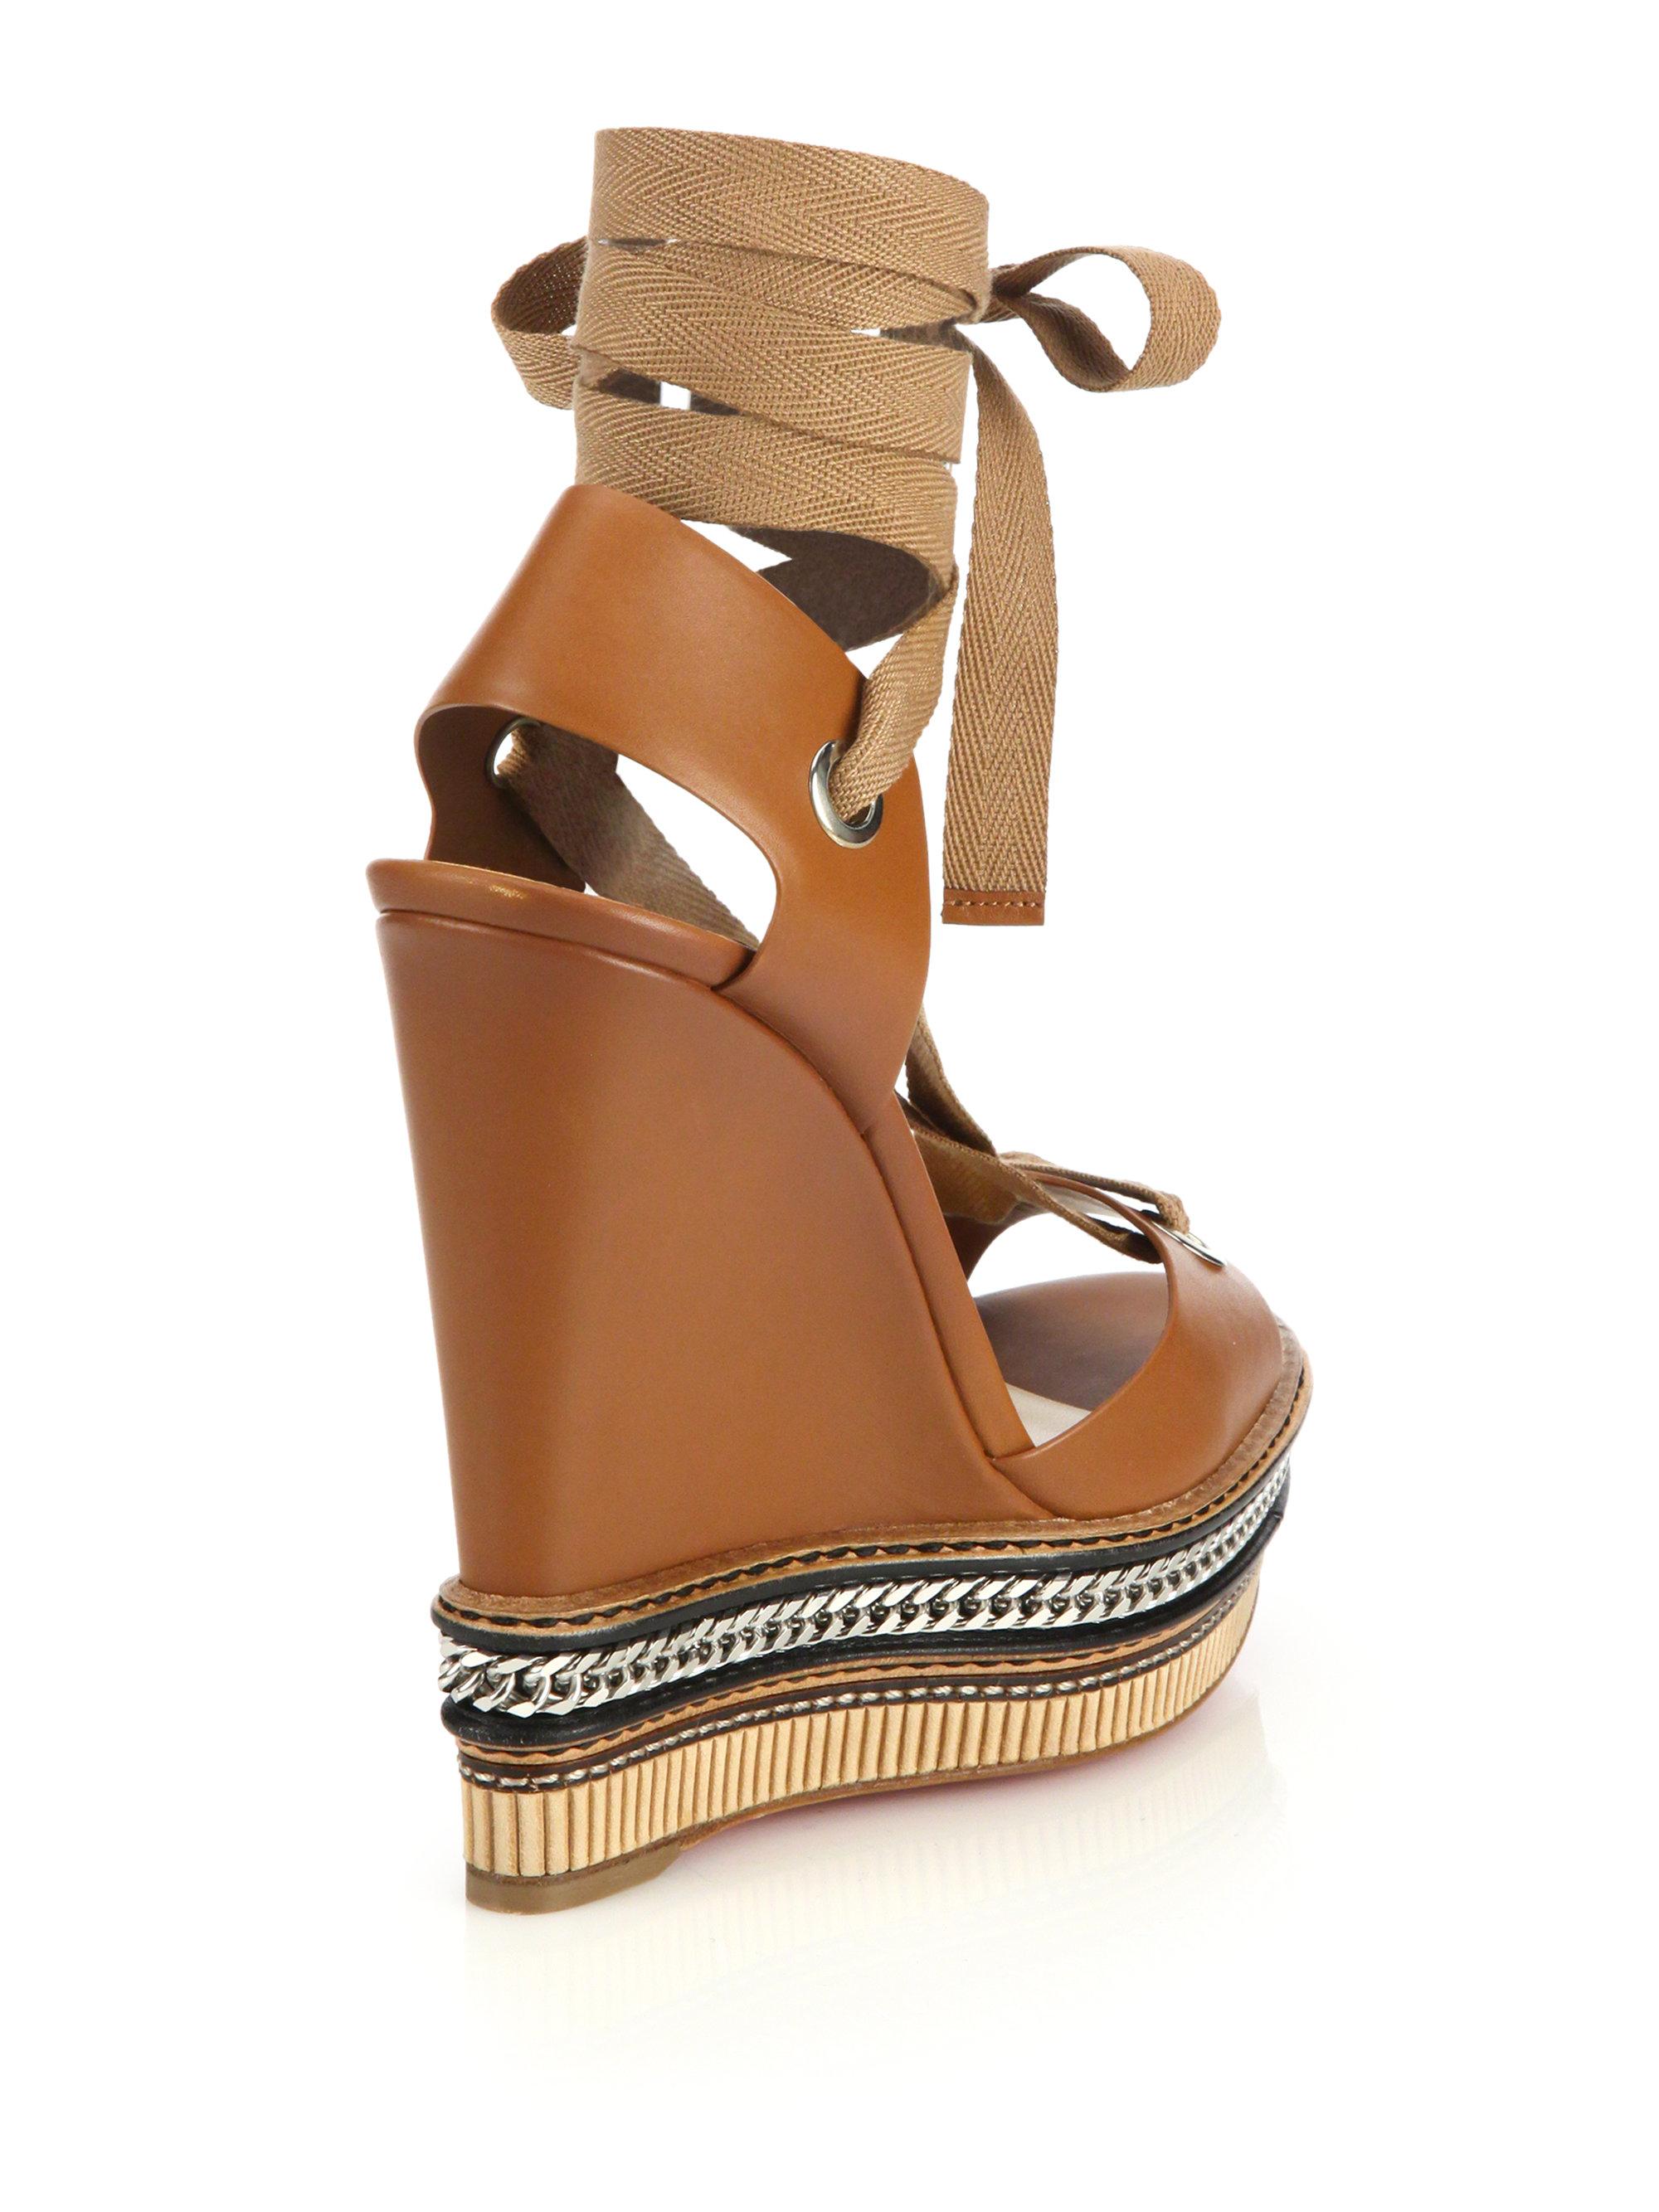 afbd700b1958 greece christian louboutin chain sandals heels d660a 3f0af